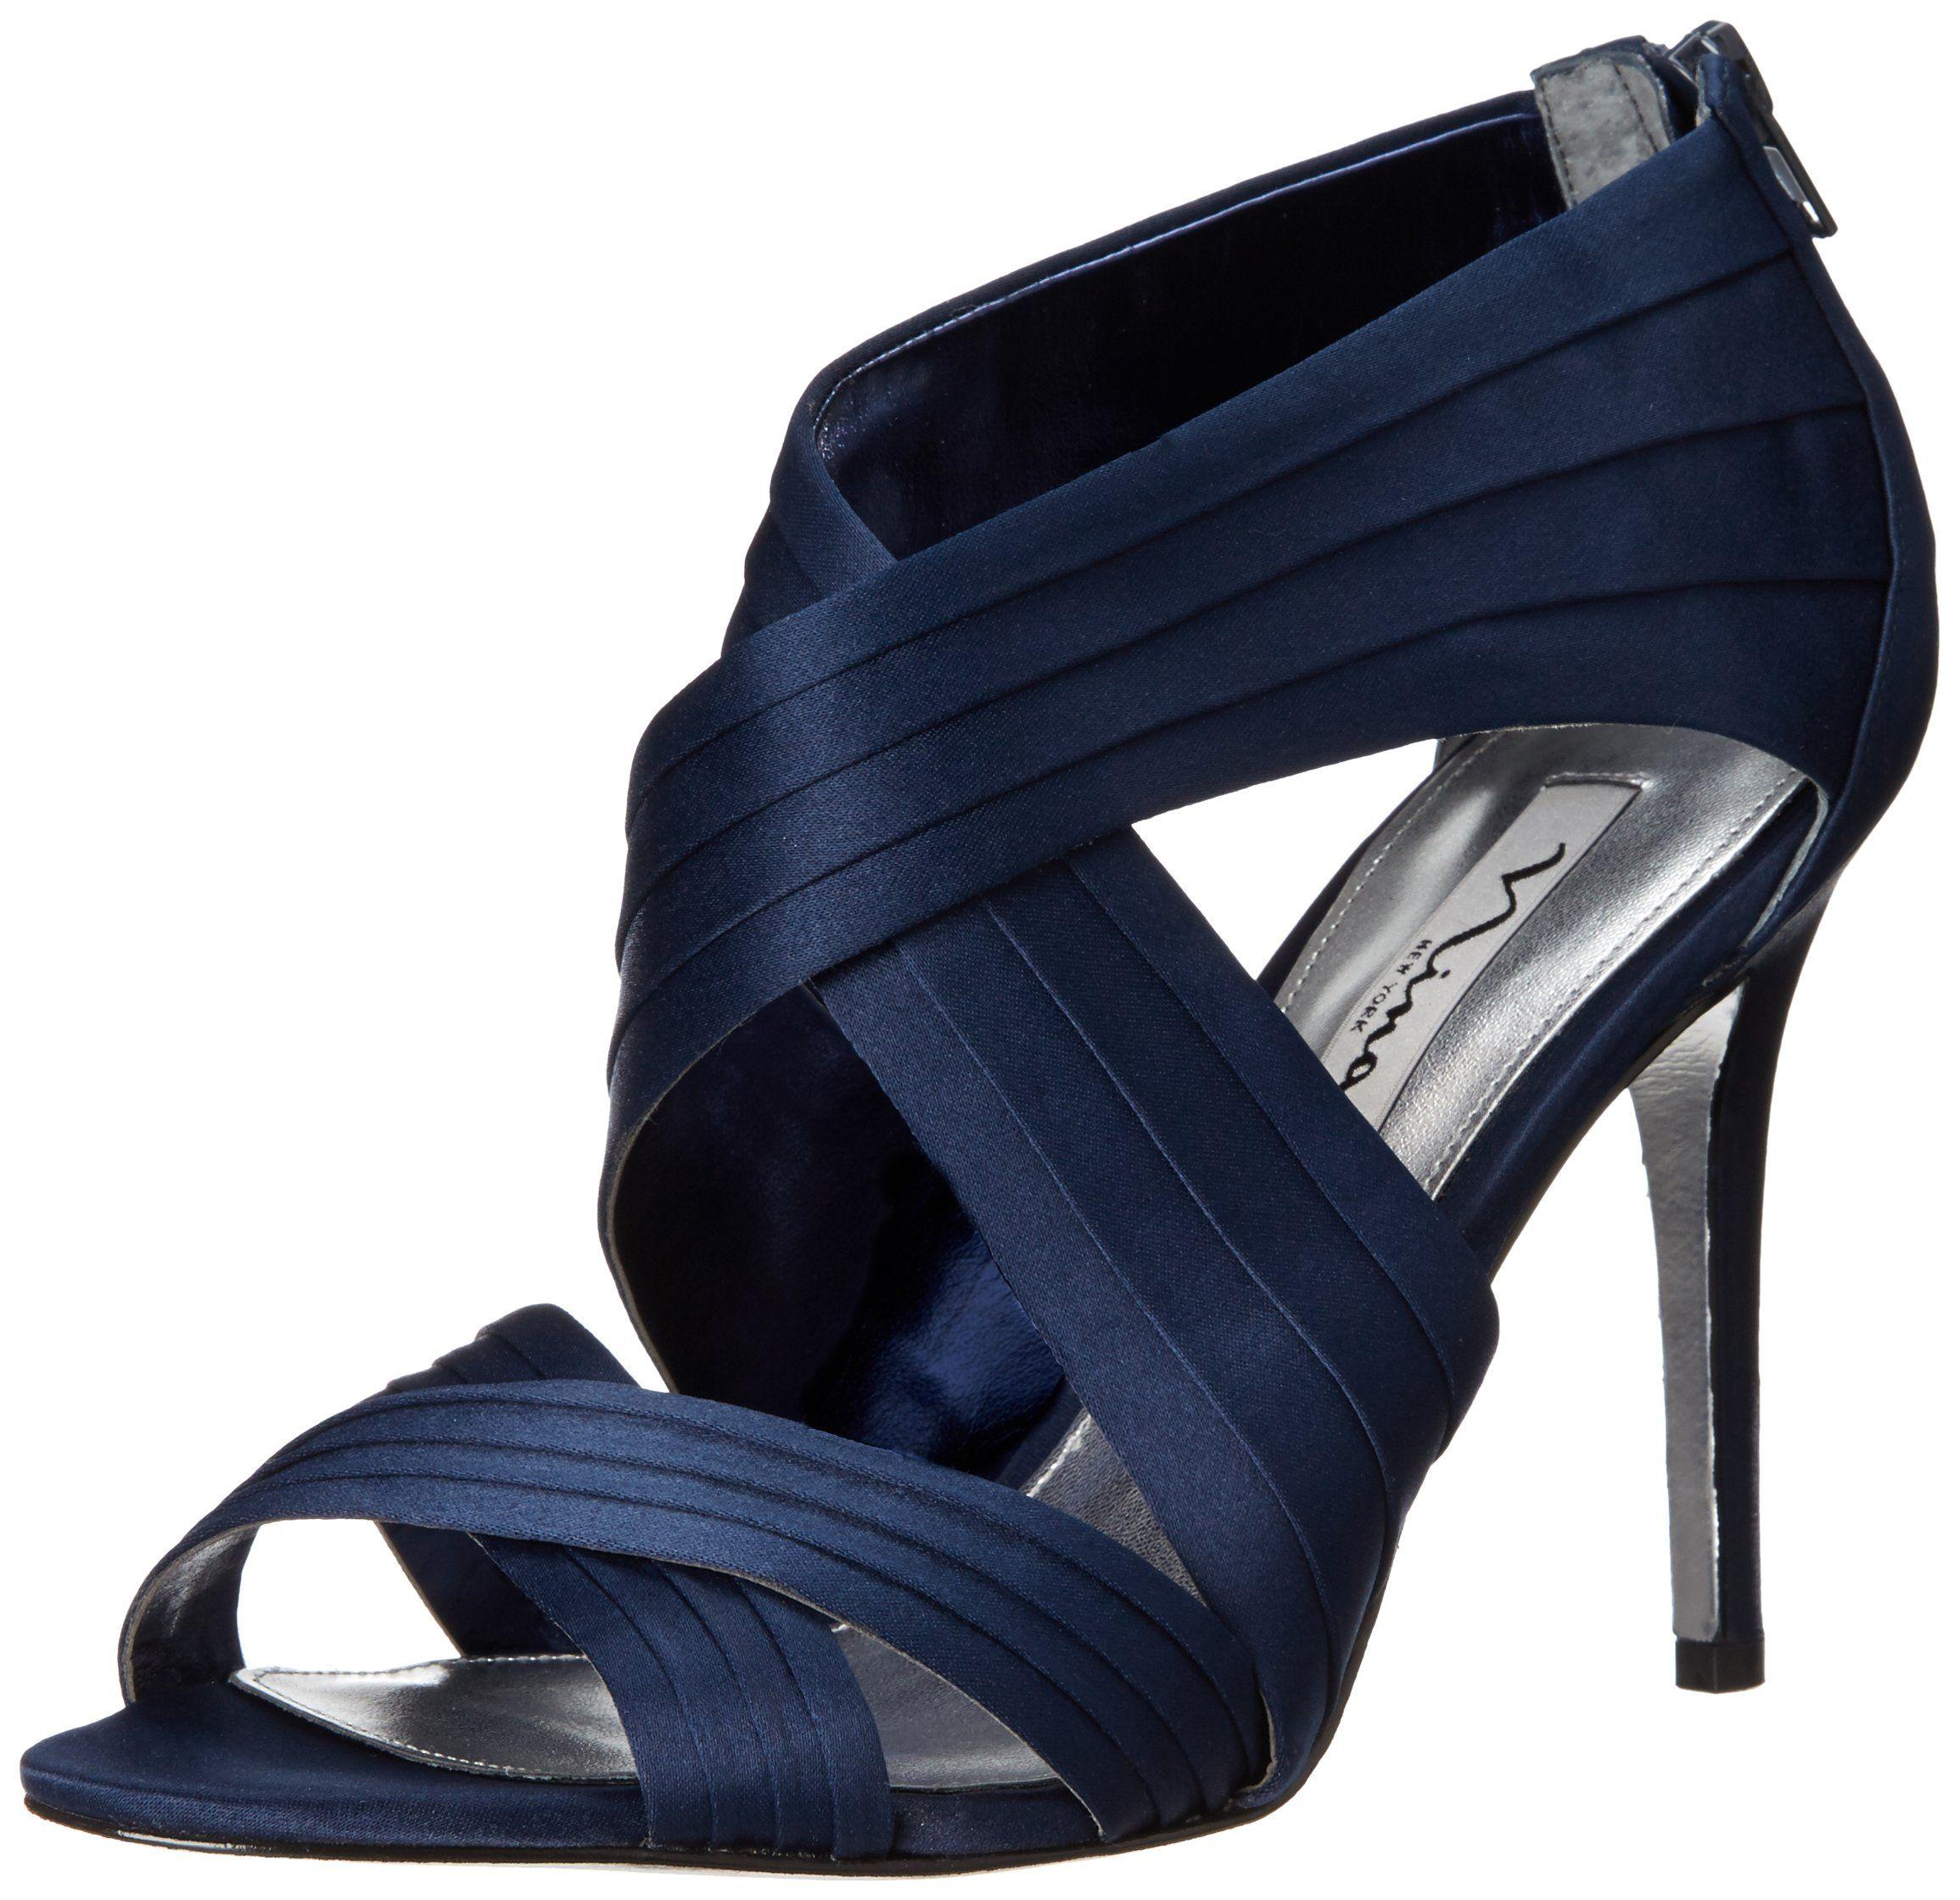 Satin heels, Dress sandals